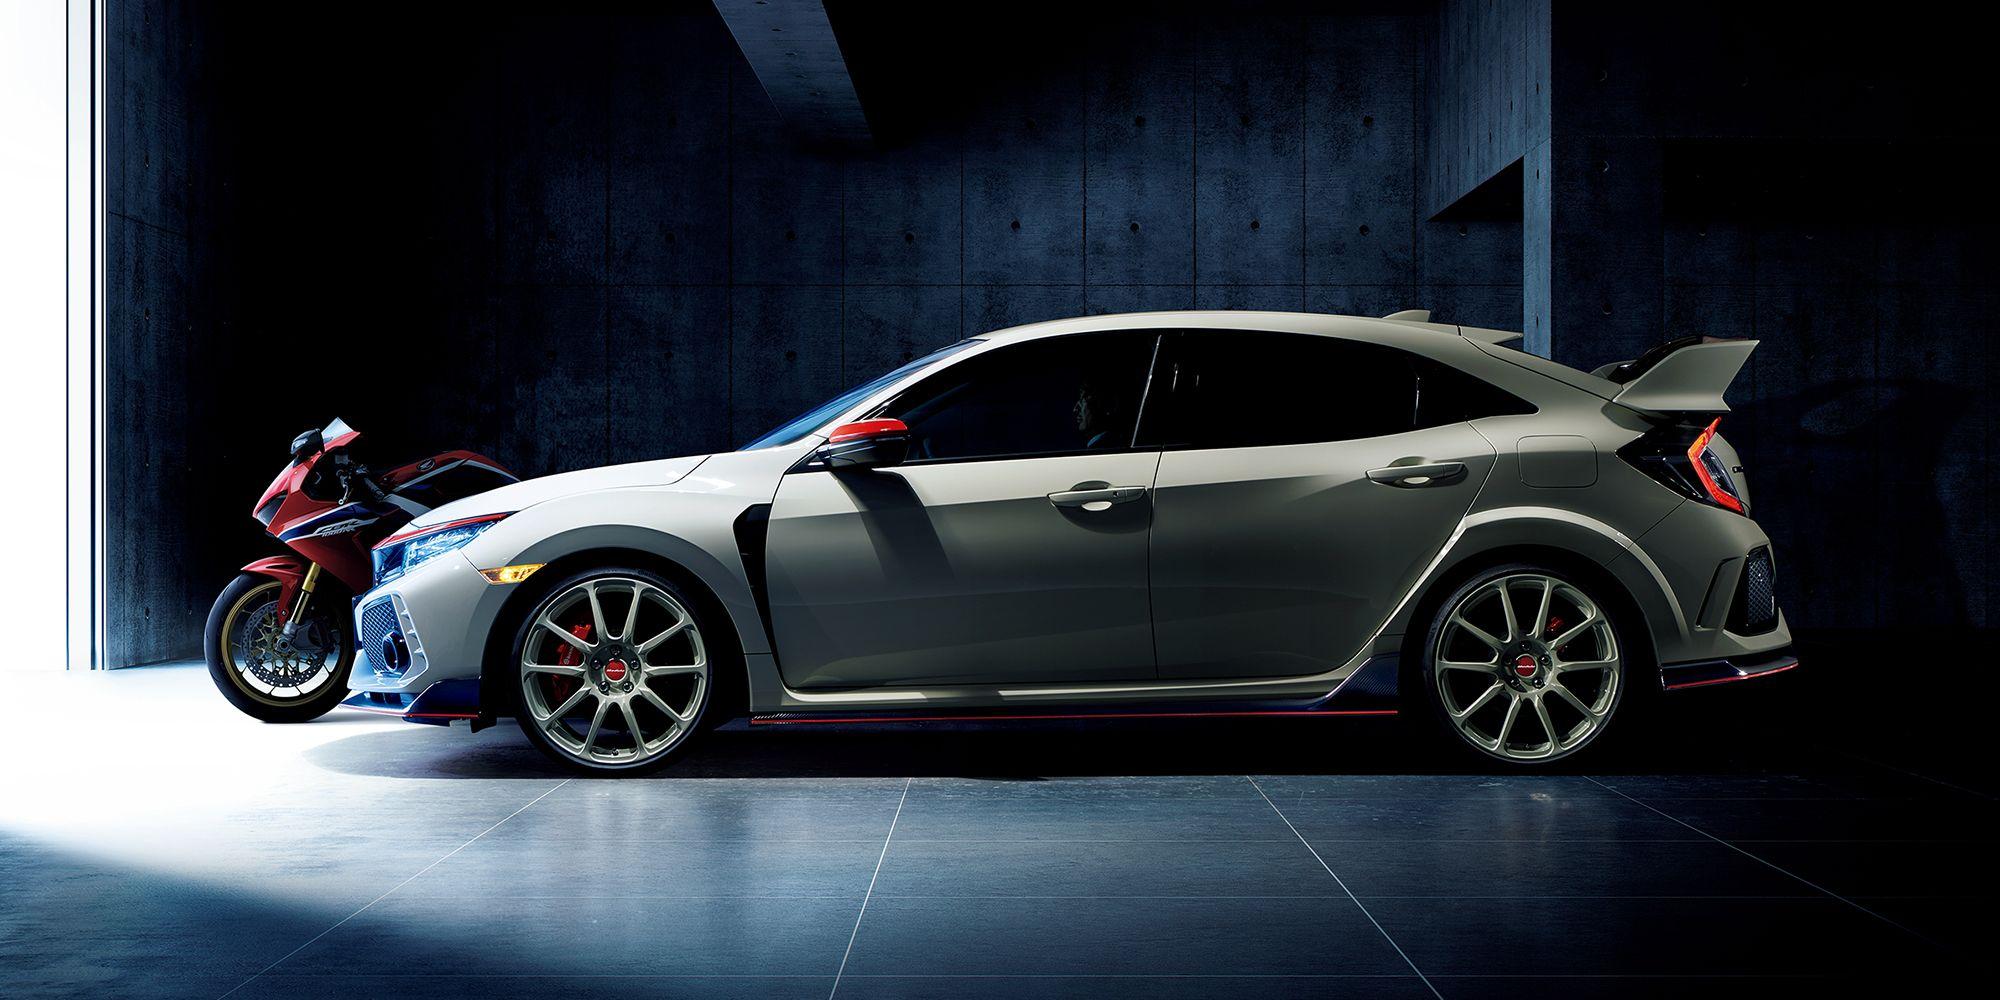 Gear Wallpaper Hd Every Honda Civic Type R Deserves These Rad White Wheels